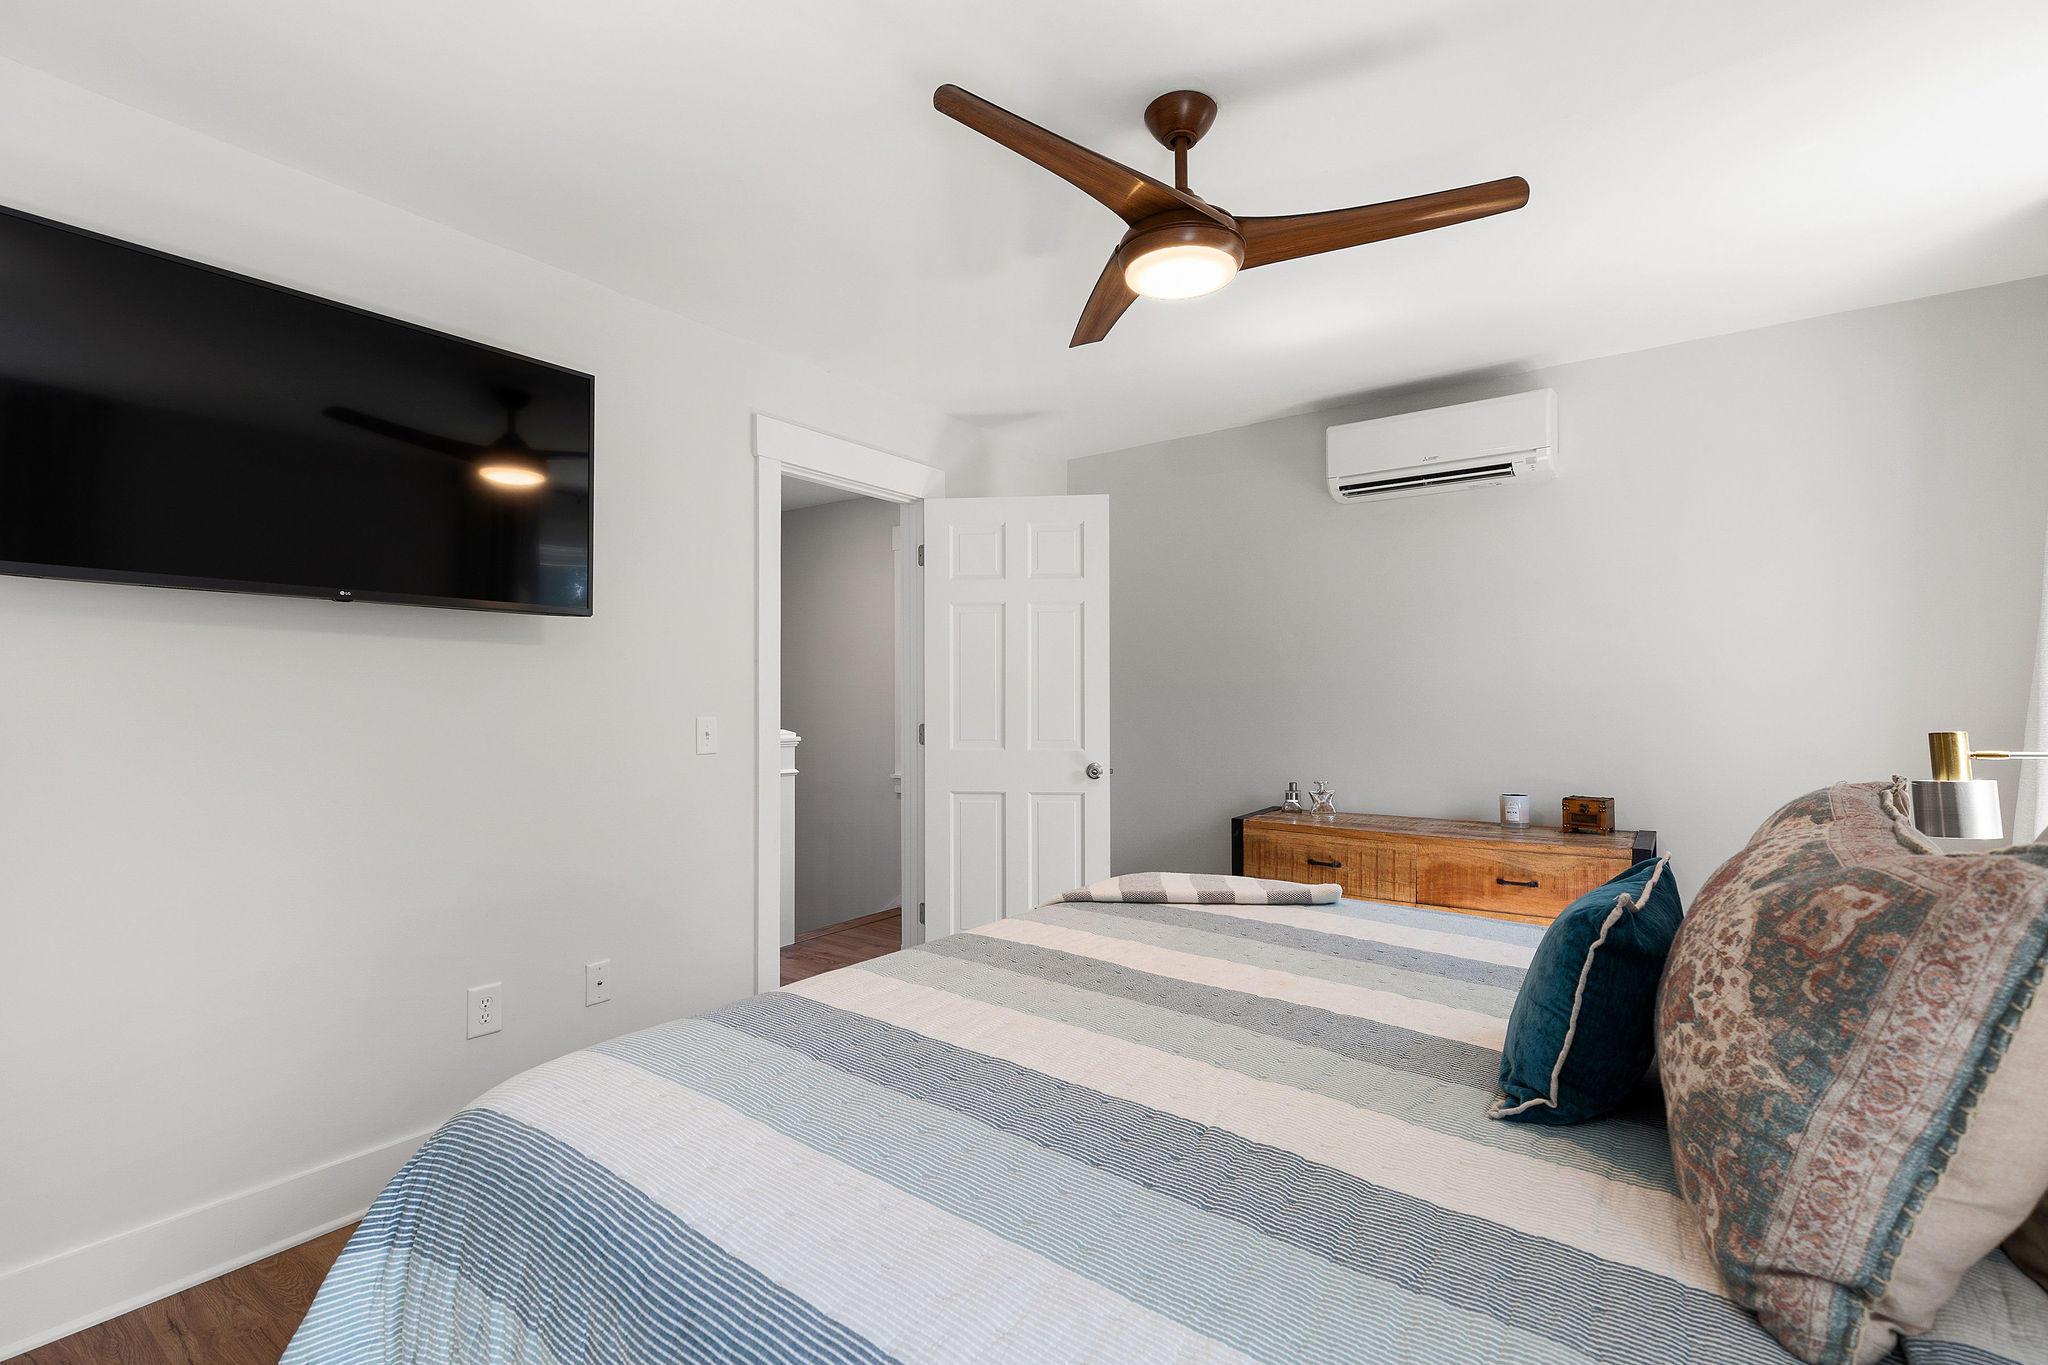 Proprietors Row Homes For Sale - 824 Colony, Charleston, SC - 2